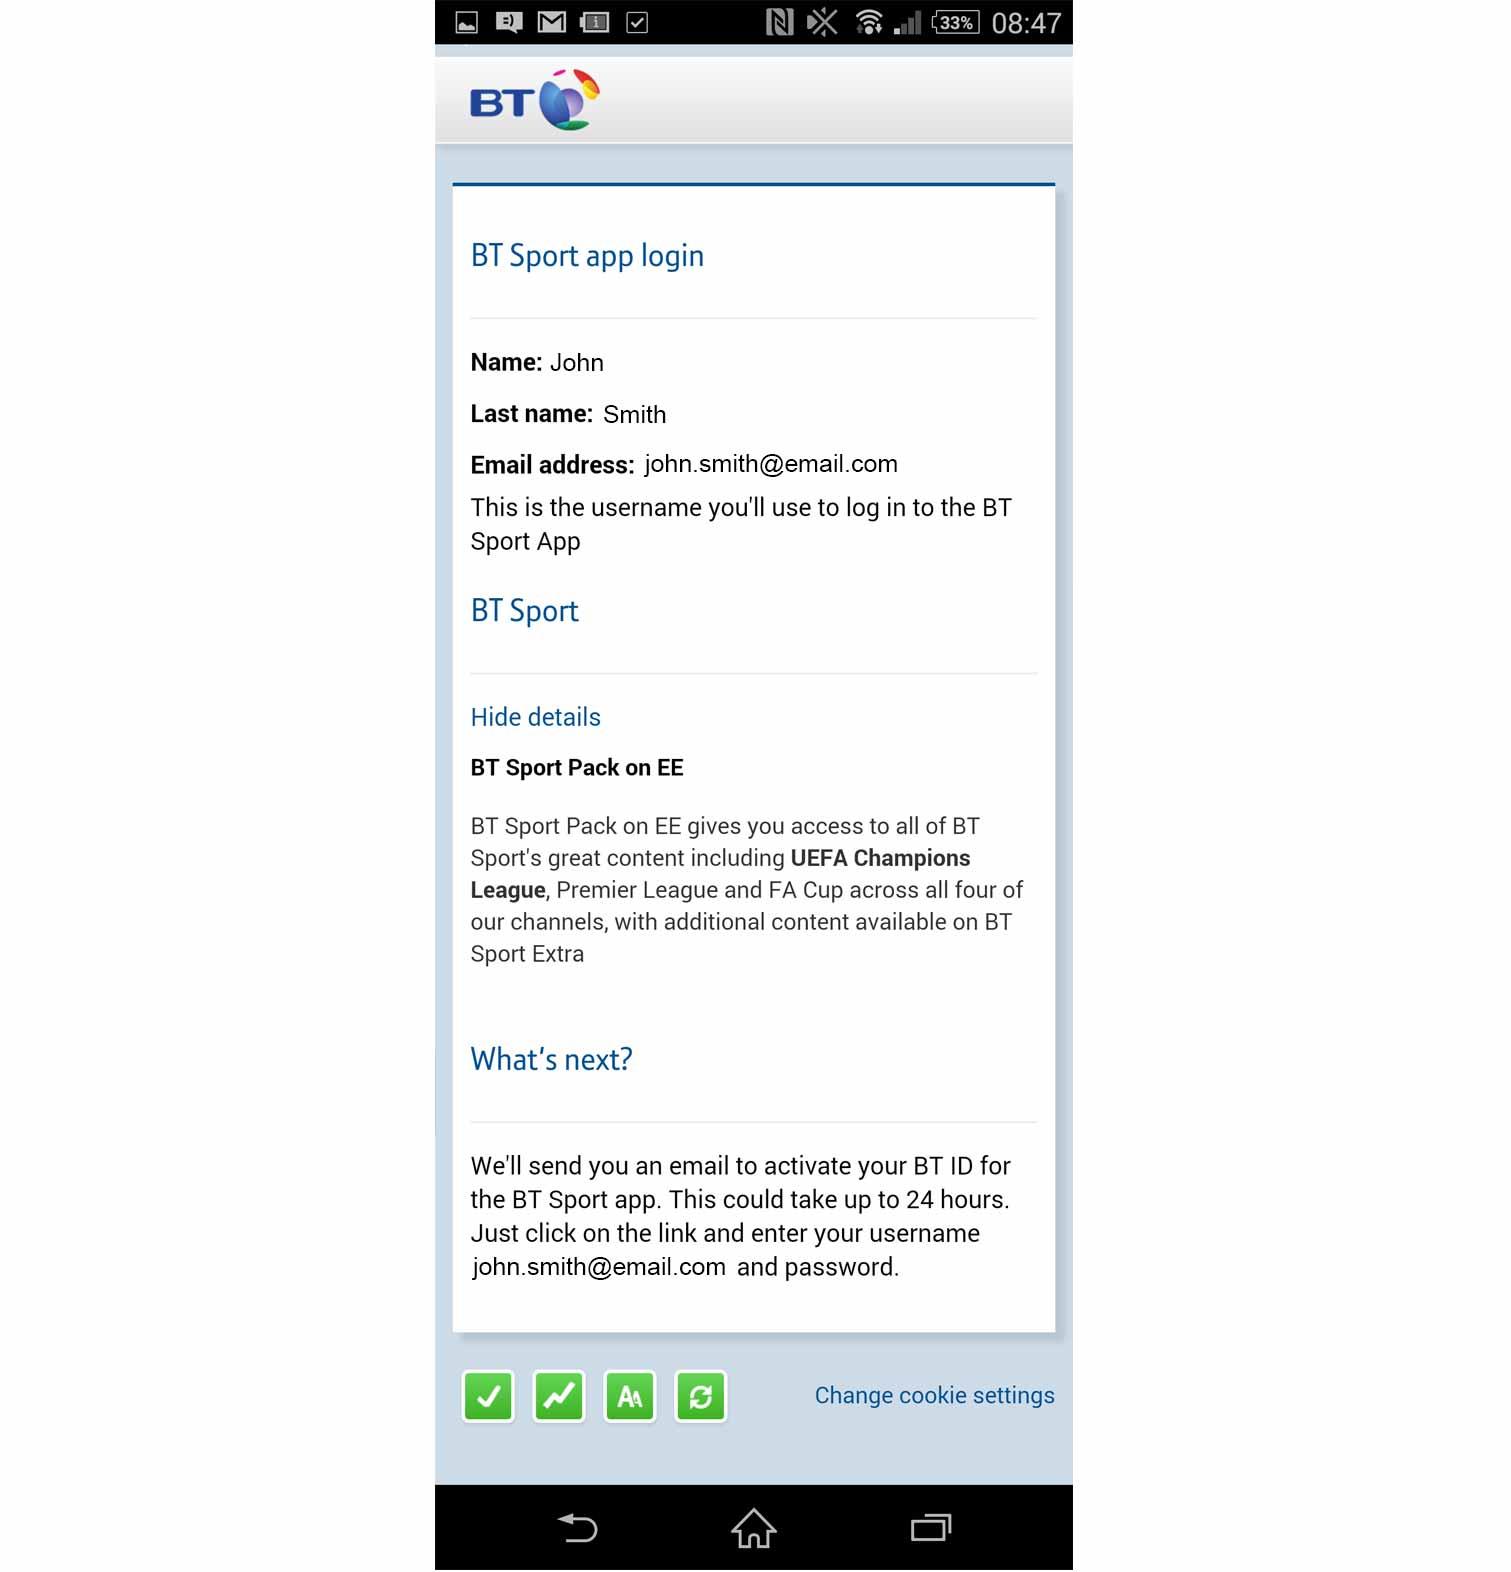 Uk customer account create downloader/downloader - Step 3 Pin Check